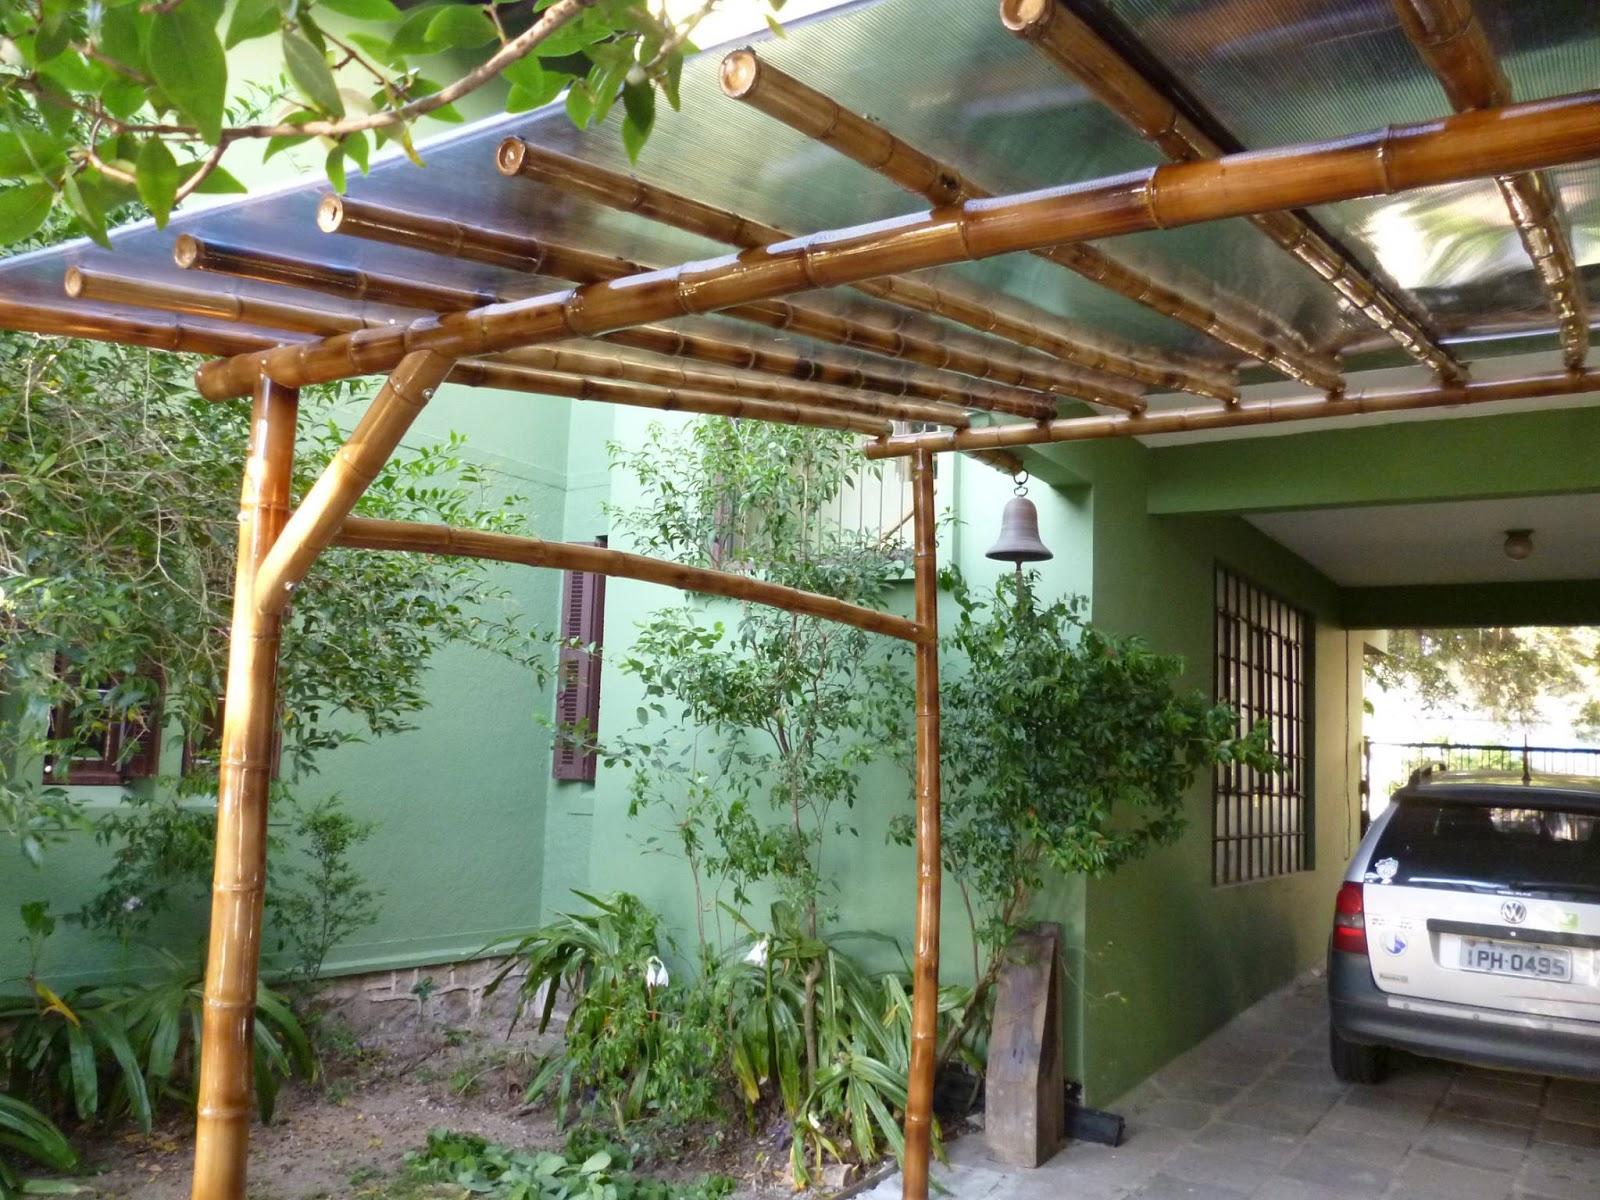 Pergolas De Bambu Top Pergola De Madera Gazebo Con Bambu O Deck  # Muebles De Jardin Easy